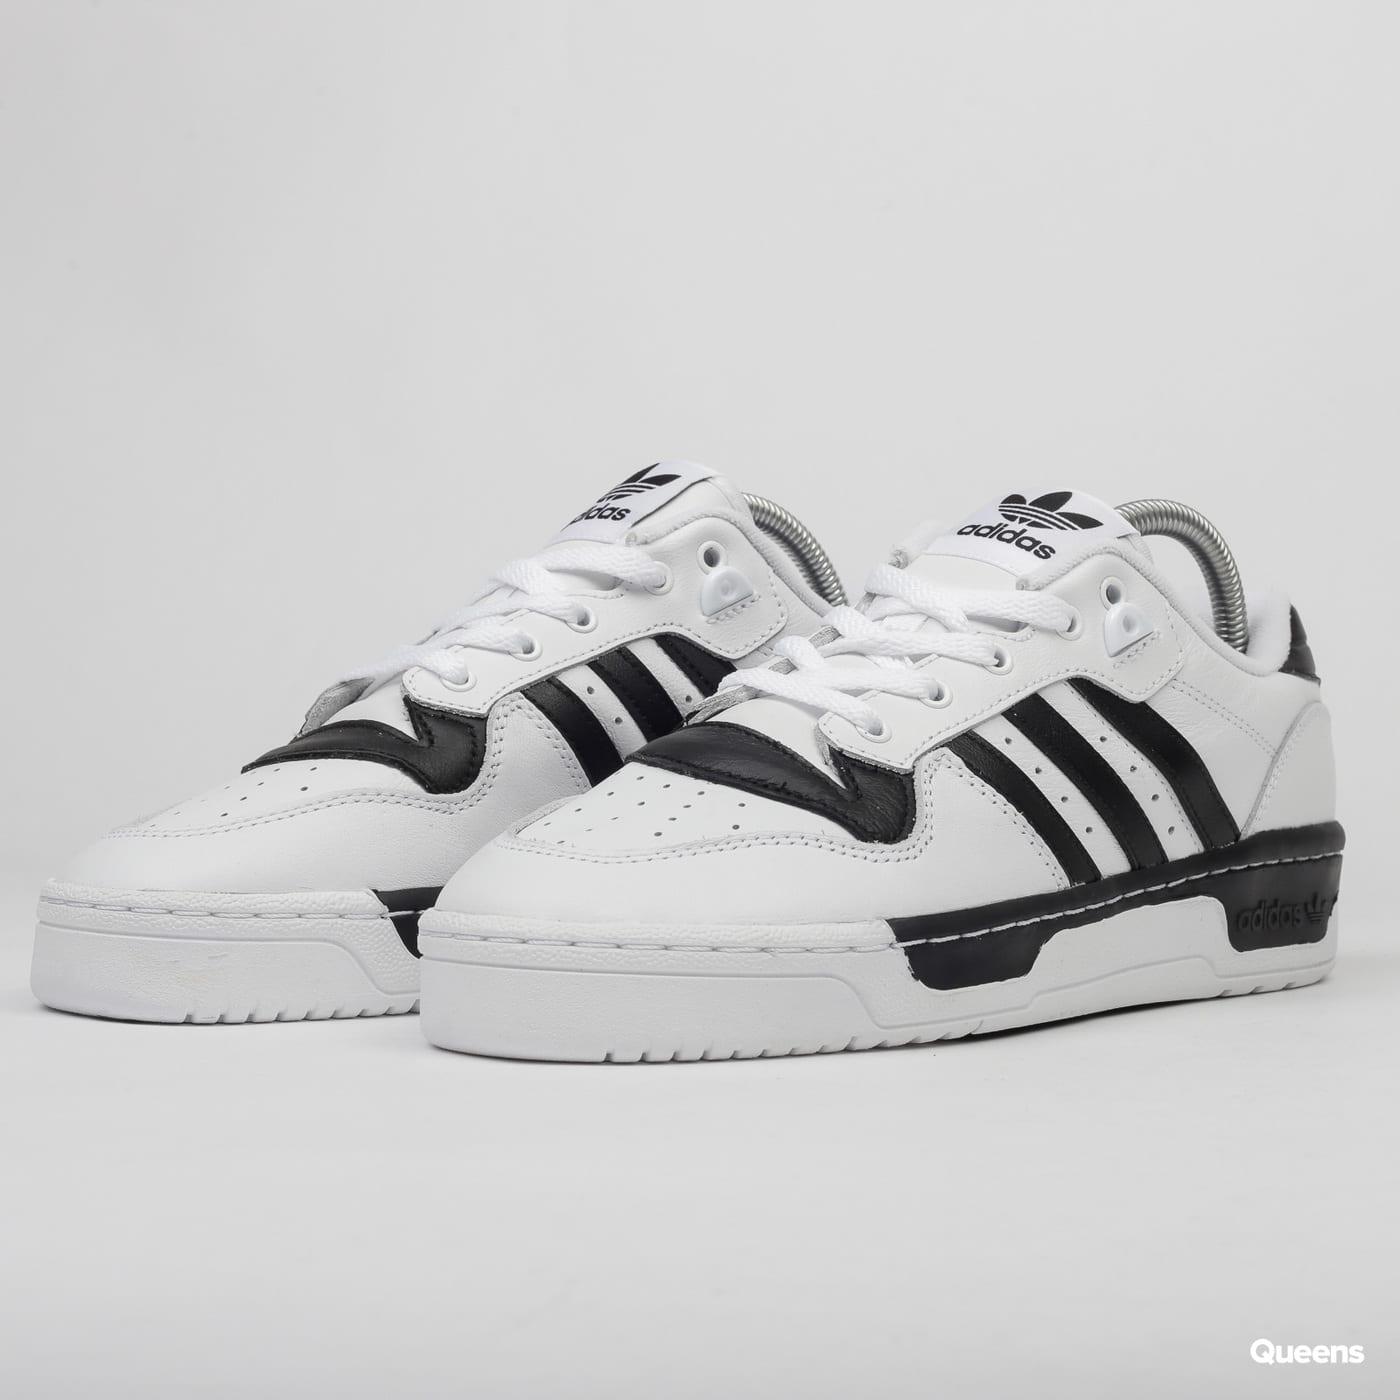 adidas Originals Rivalry Low ftwwht / ftwwht / cblack